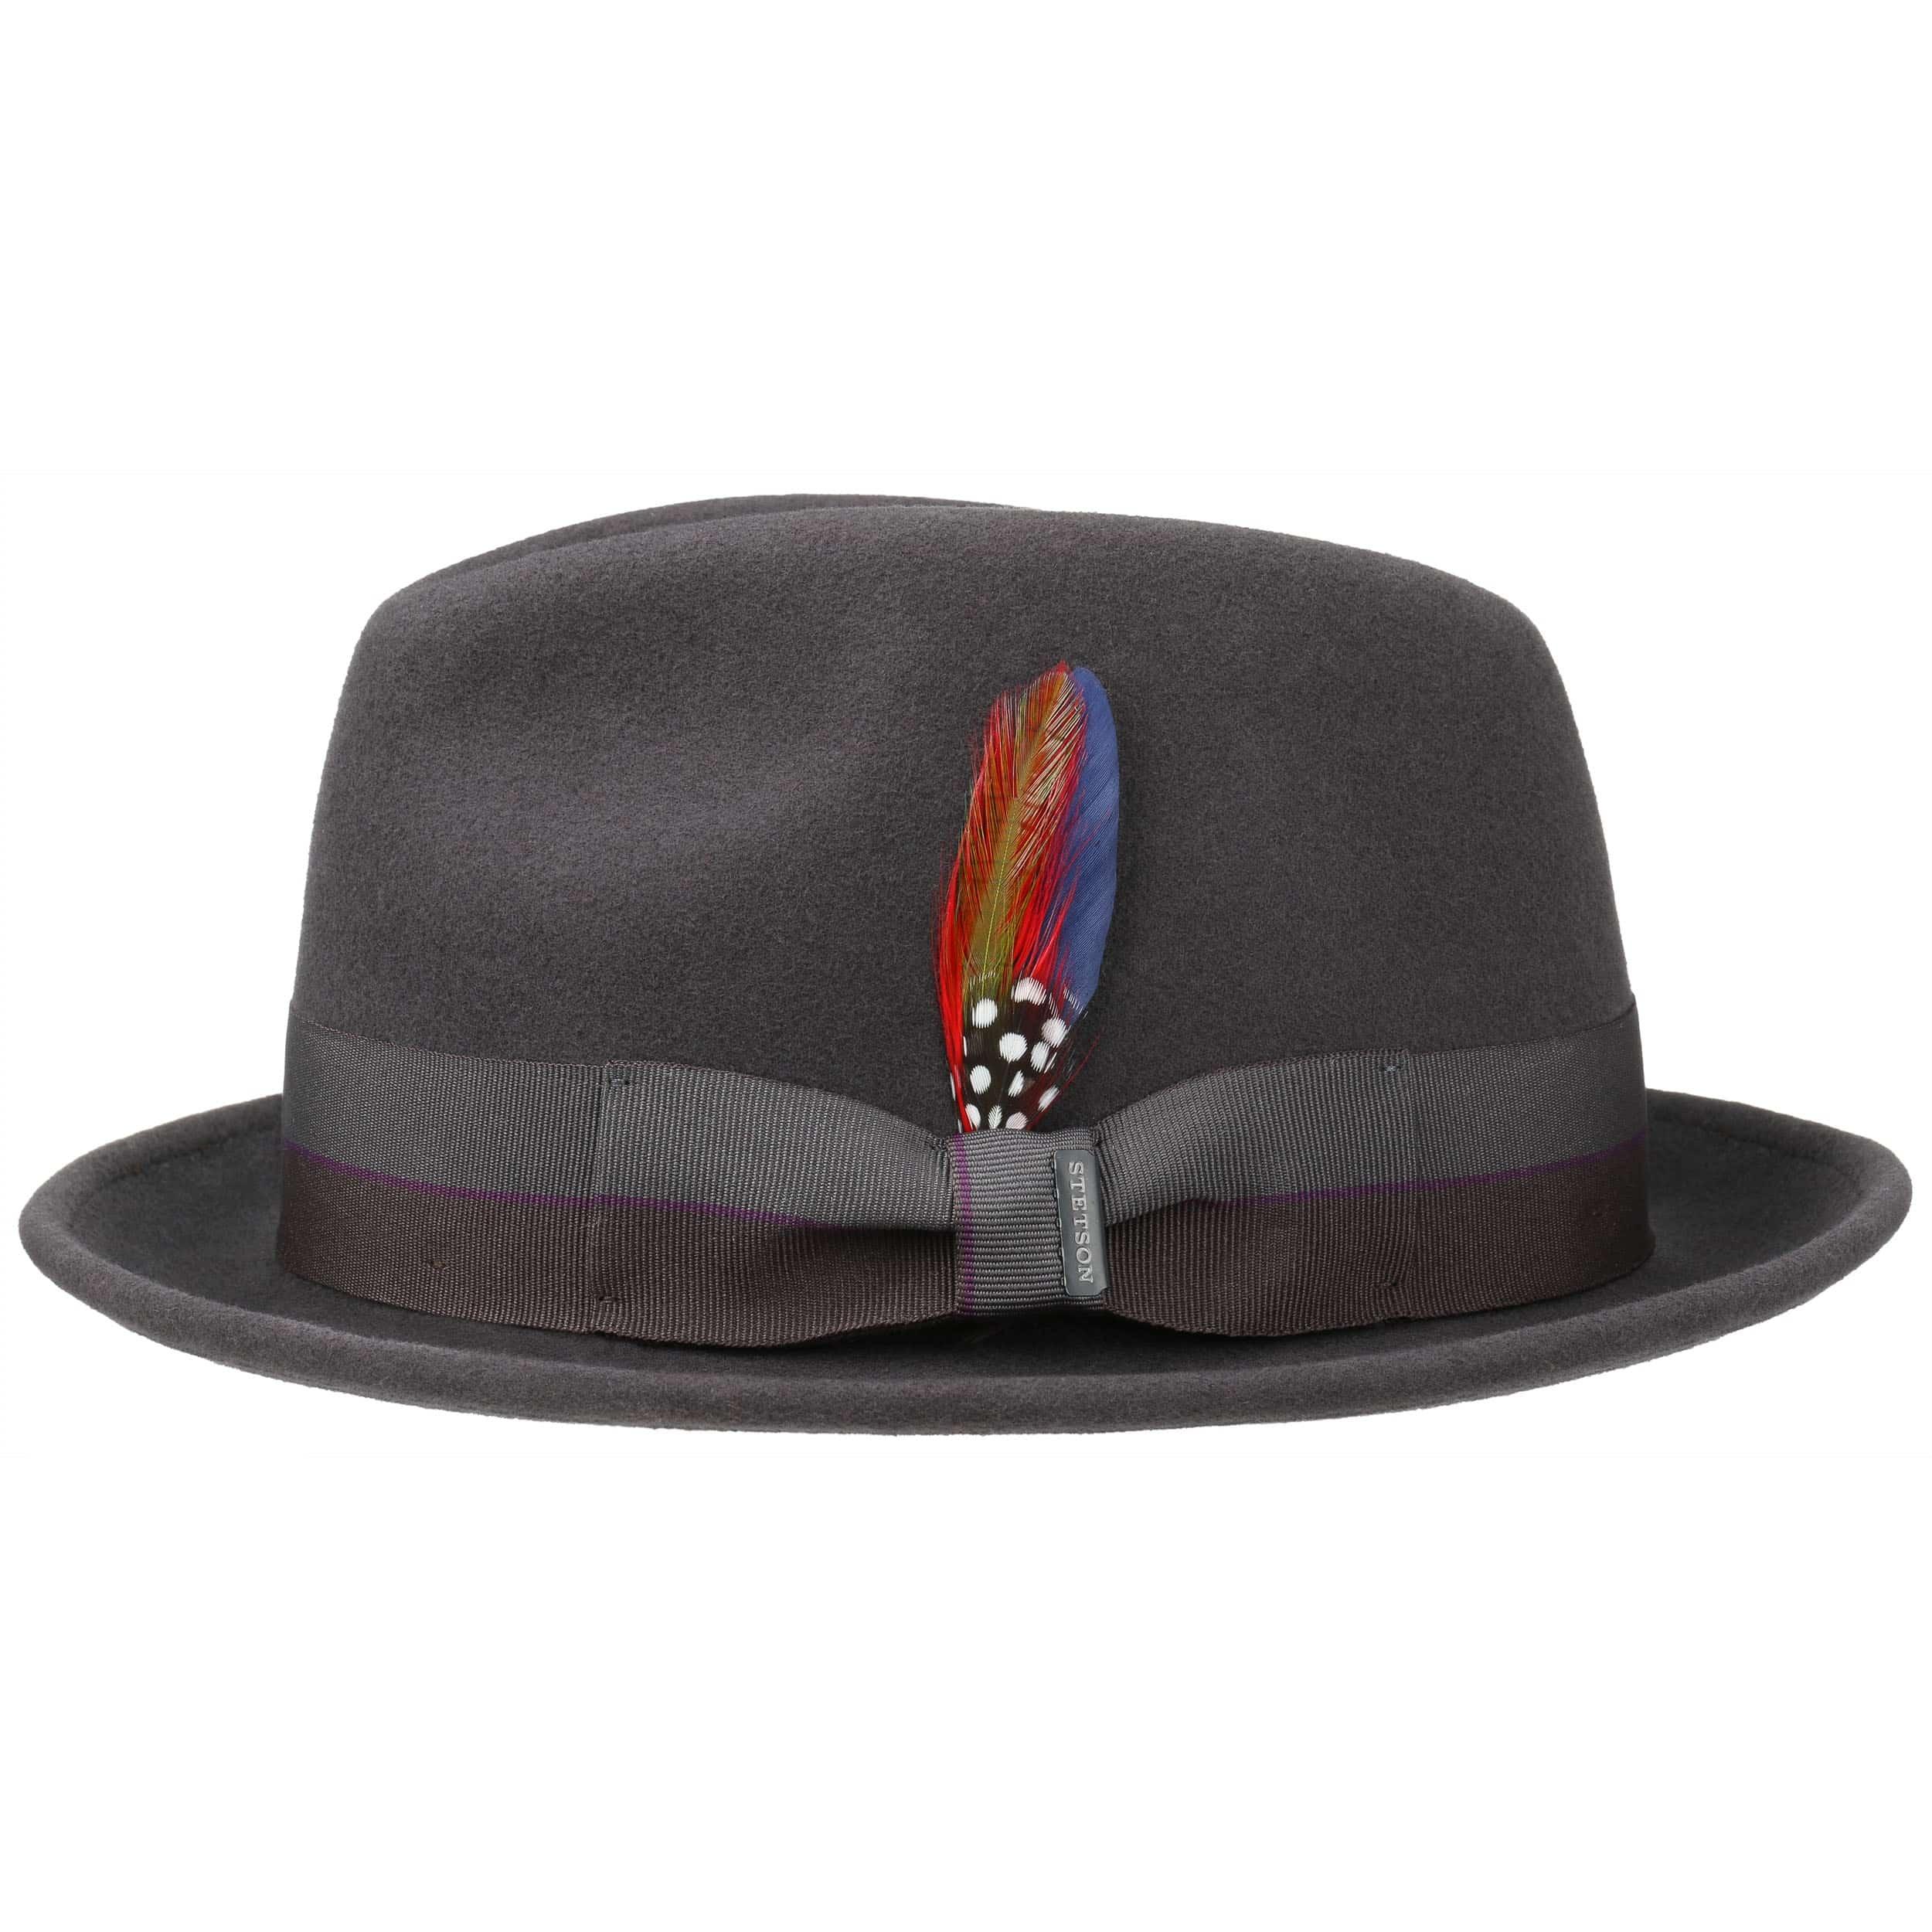 Sapiro Player Hat Wool Felt Hat by Stetson 7f8cbf8dd15